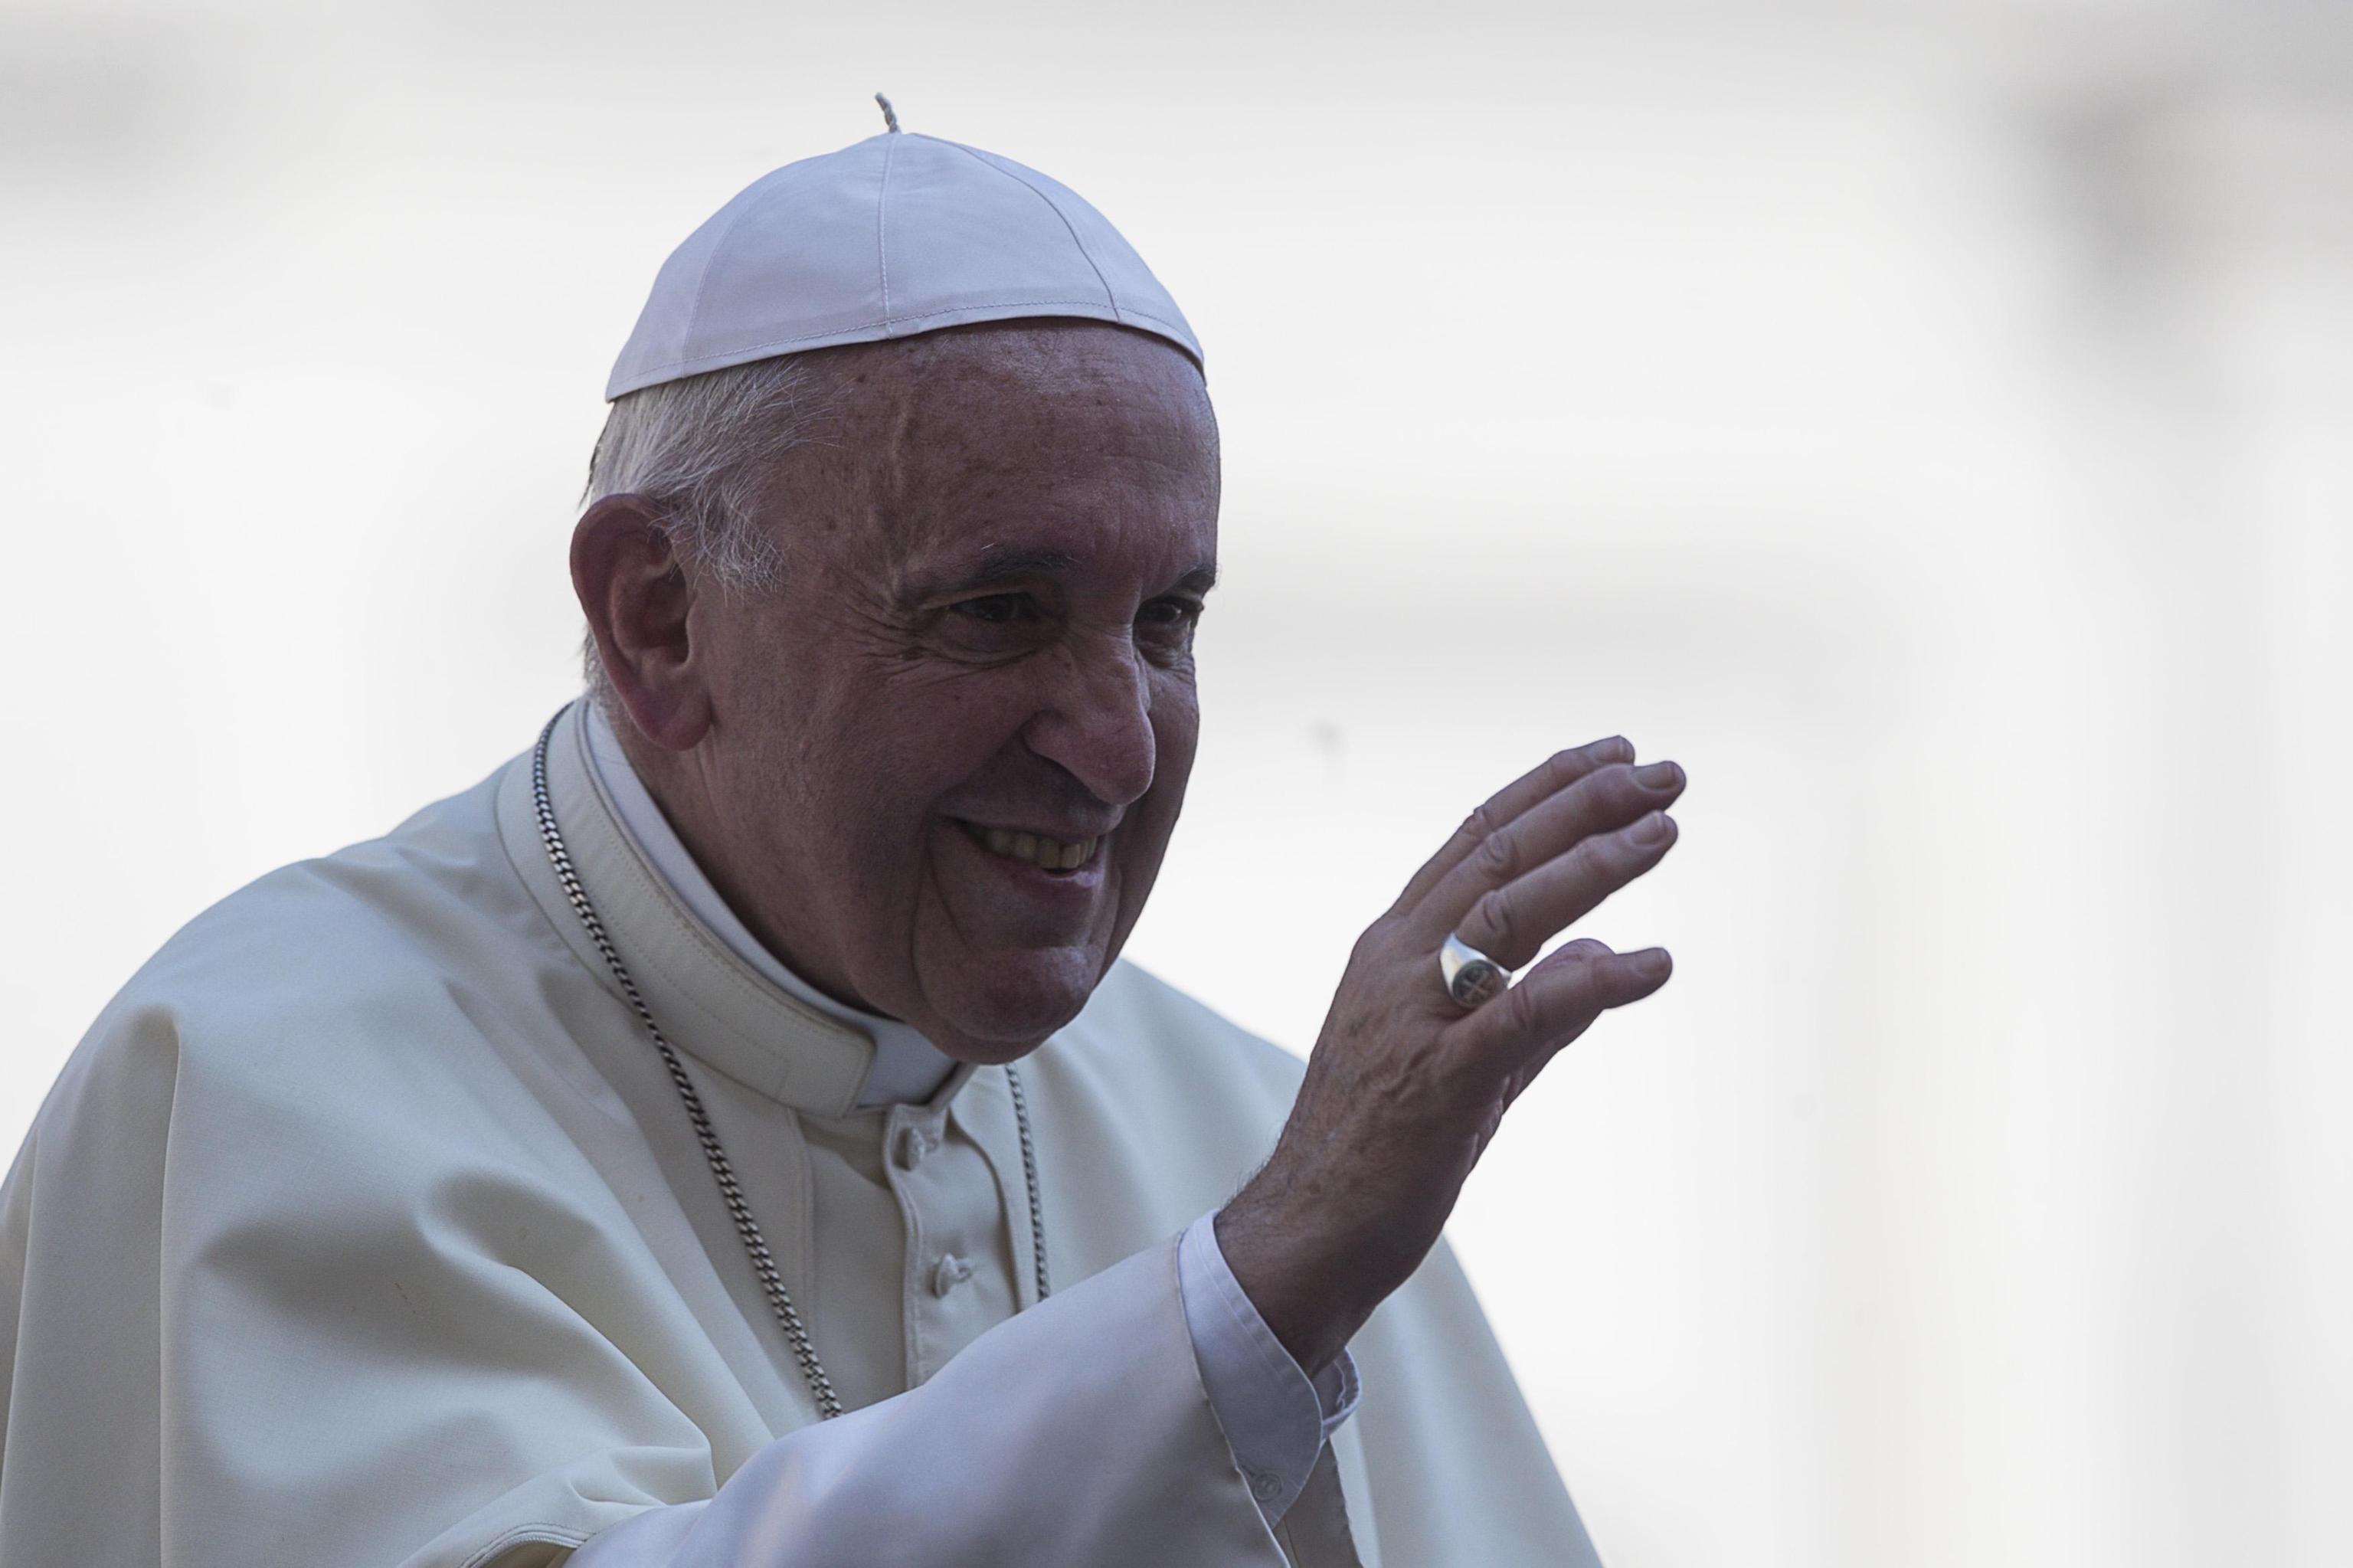 Vescovo rimosso India Papa Francesco Sicilia Cronaca